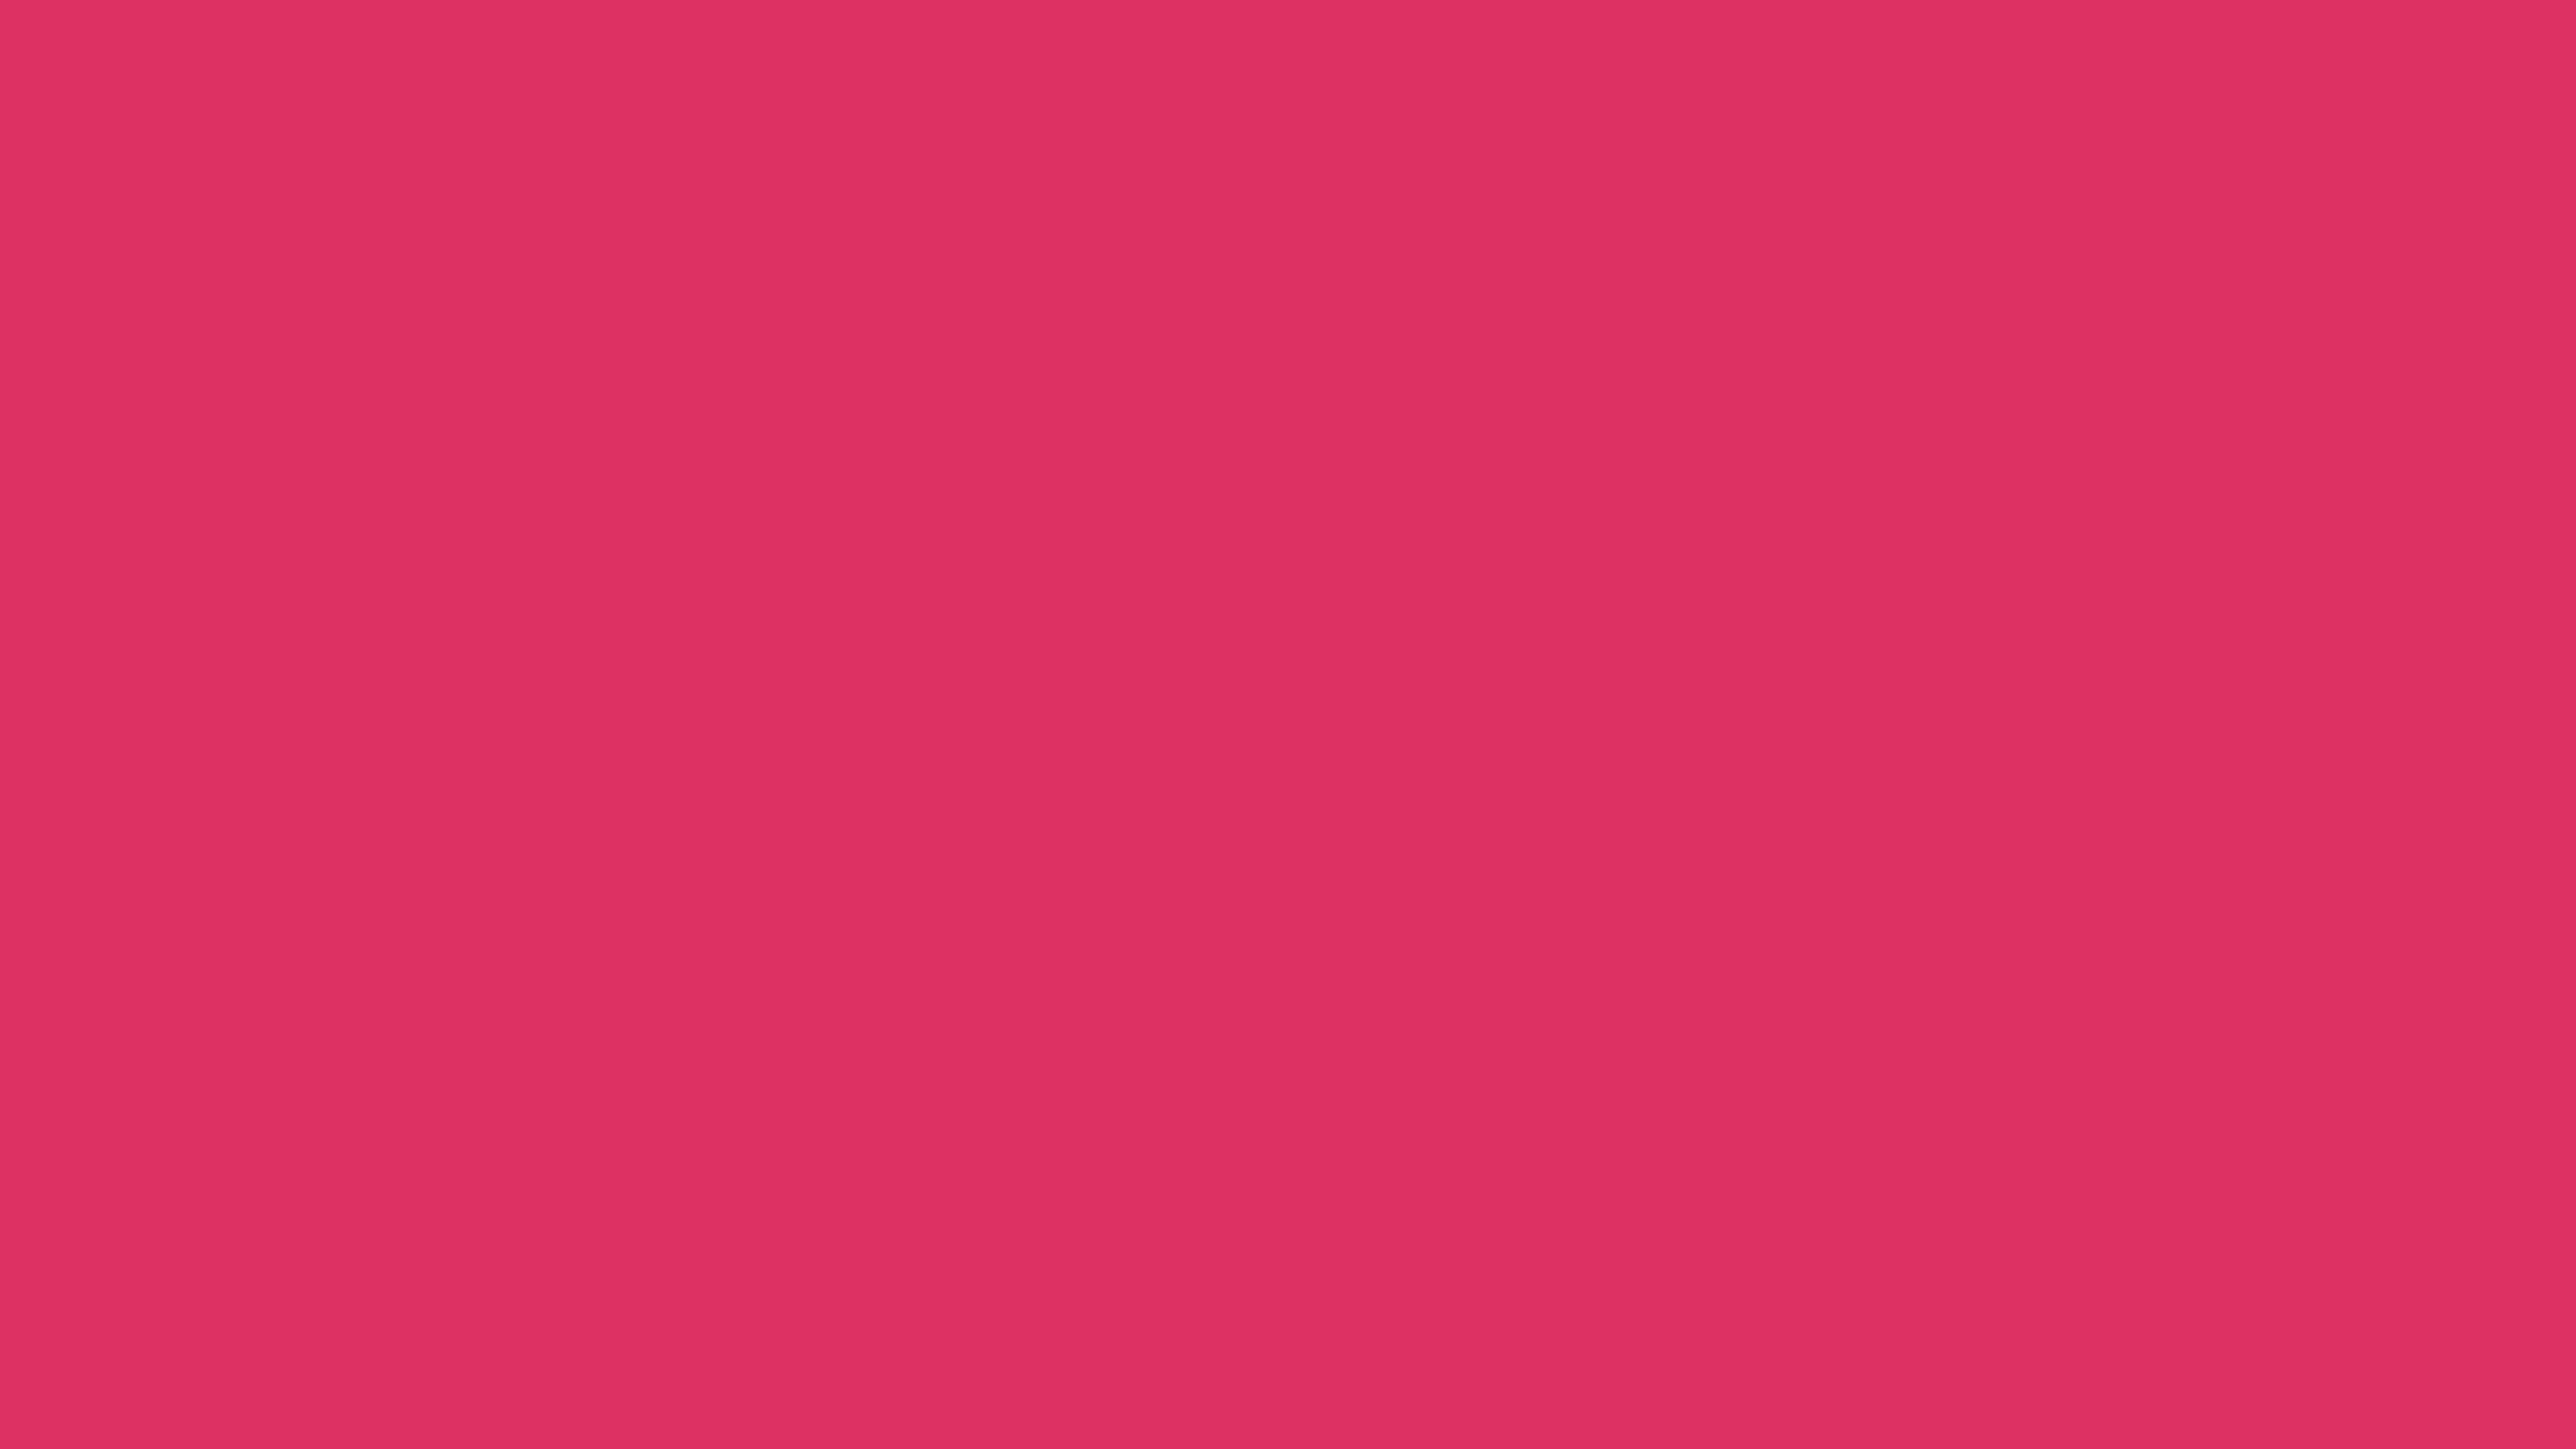 7680x4320 Cerise Solid Color Background